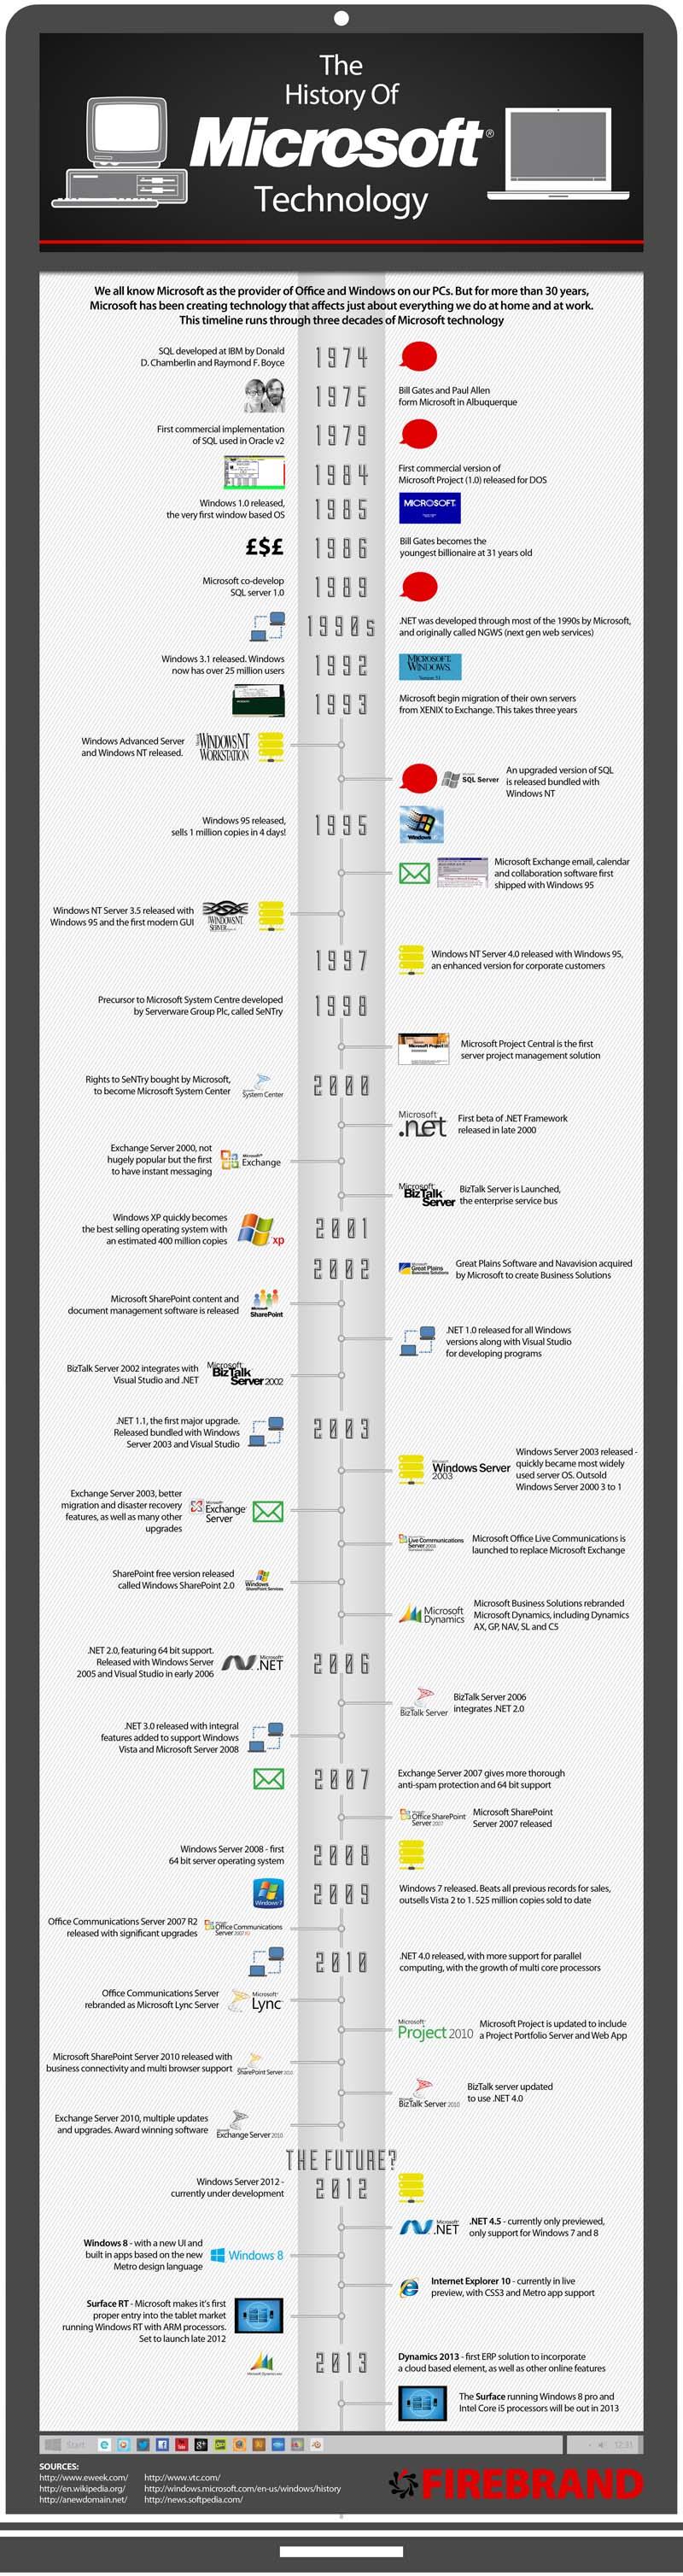 History of Microsoft Technology